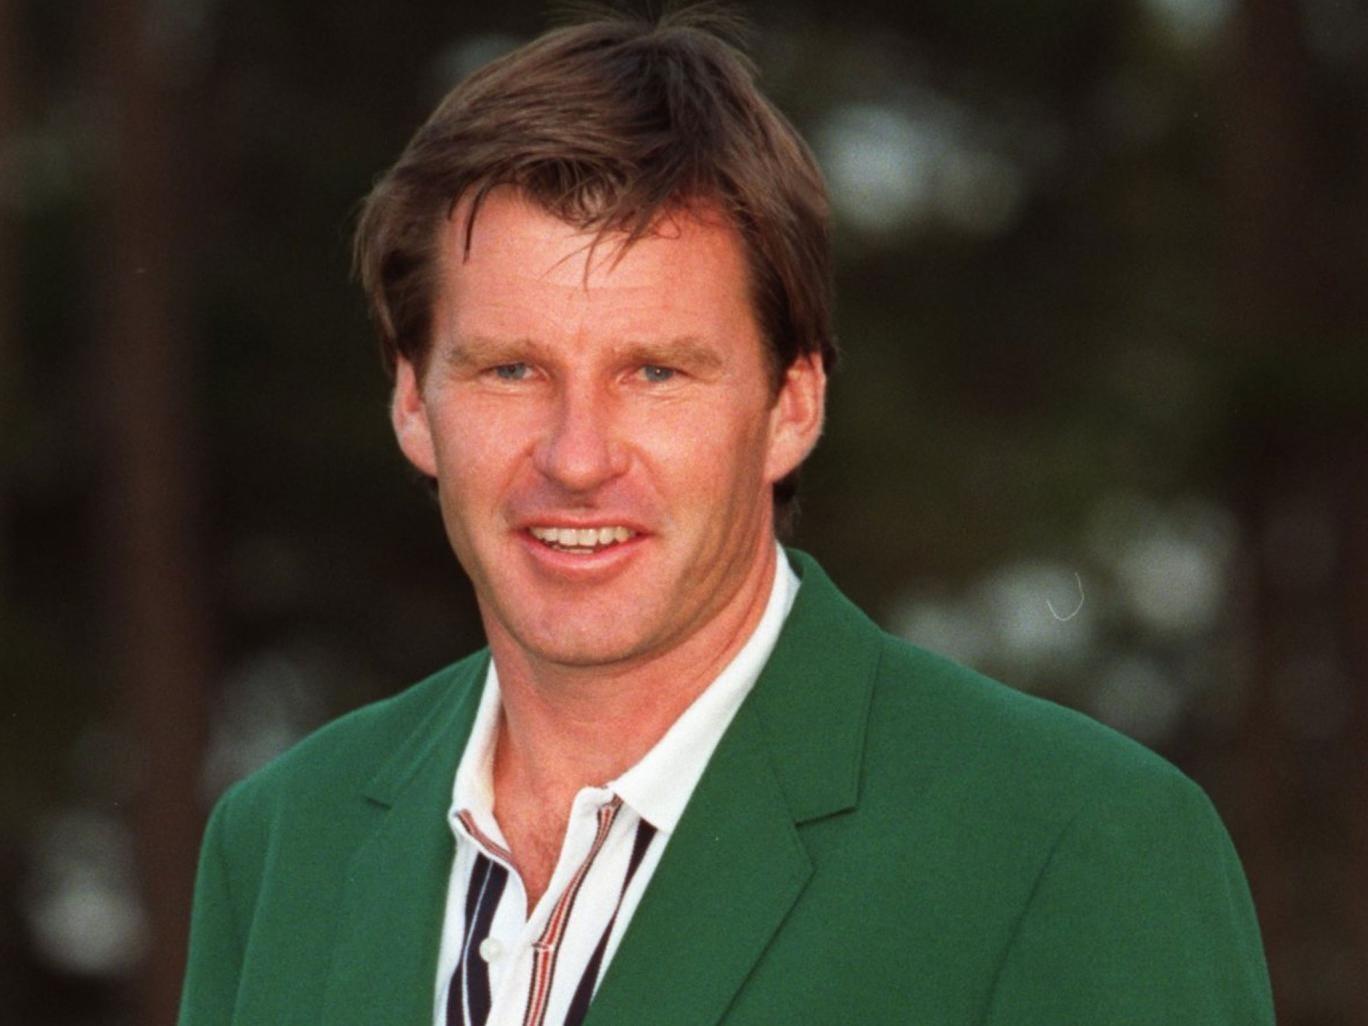 Way back when: Nick Faldo sports the green jacket in 1996